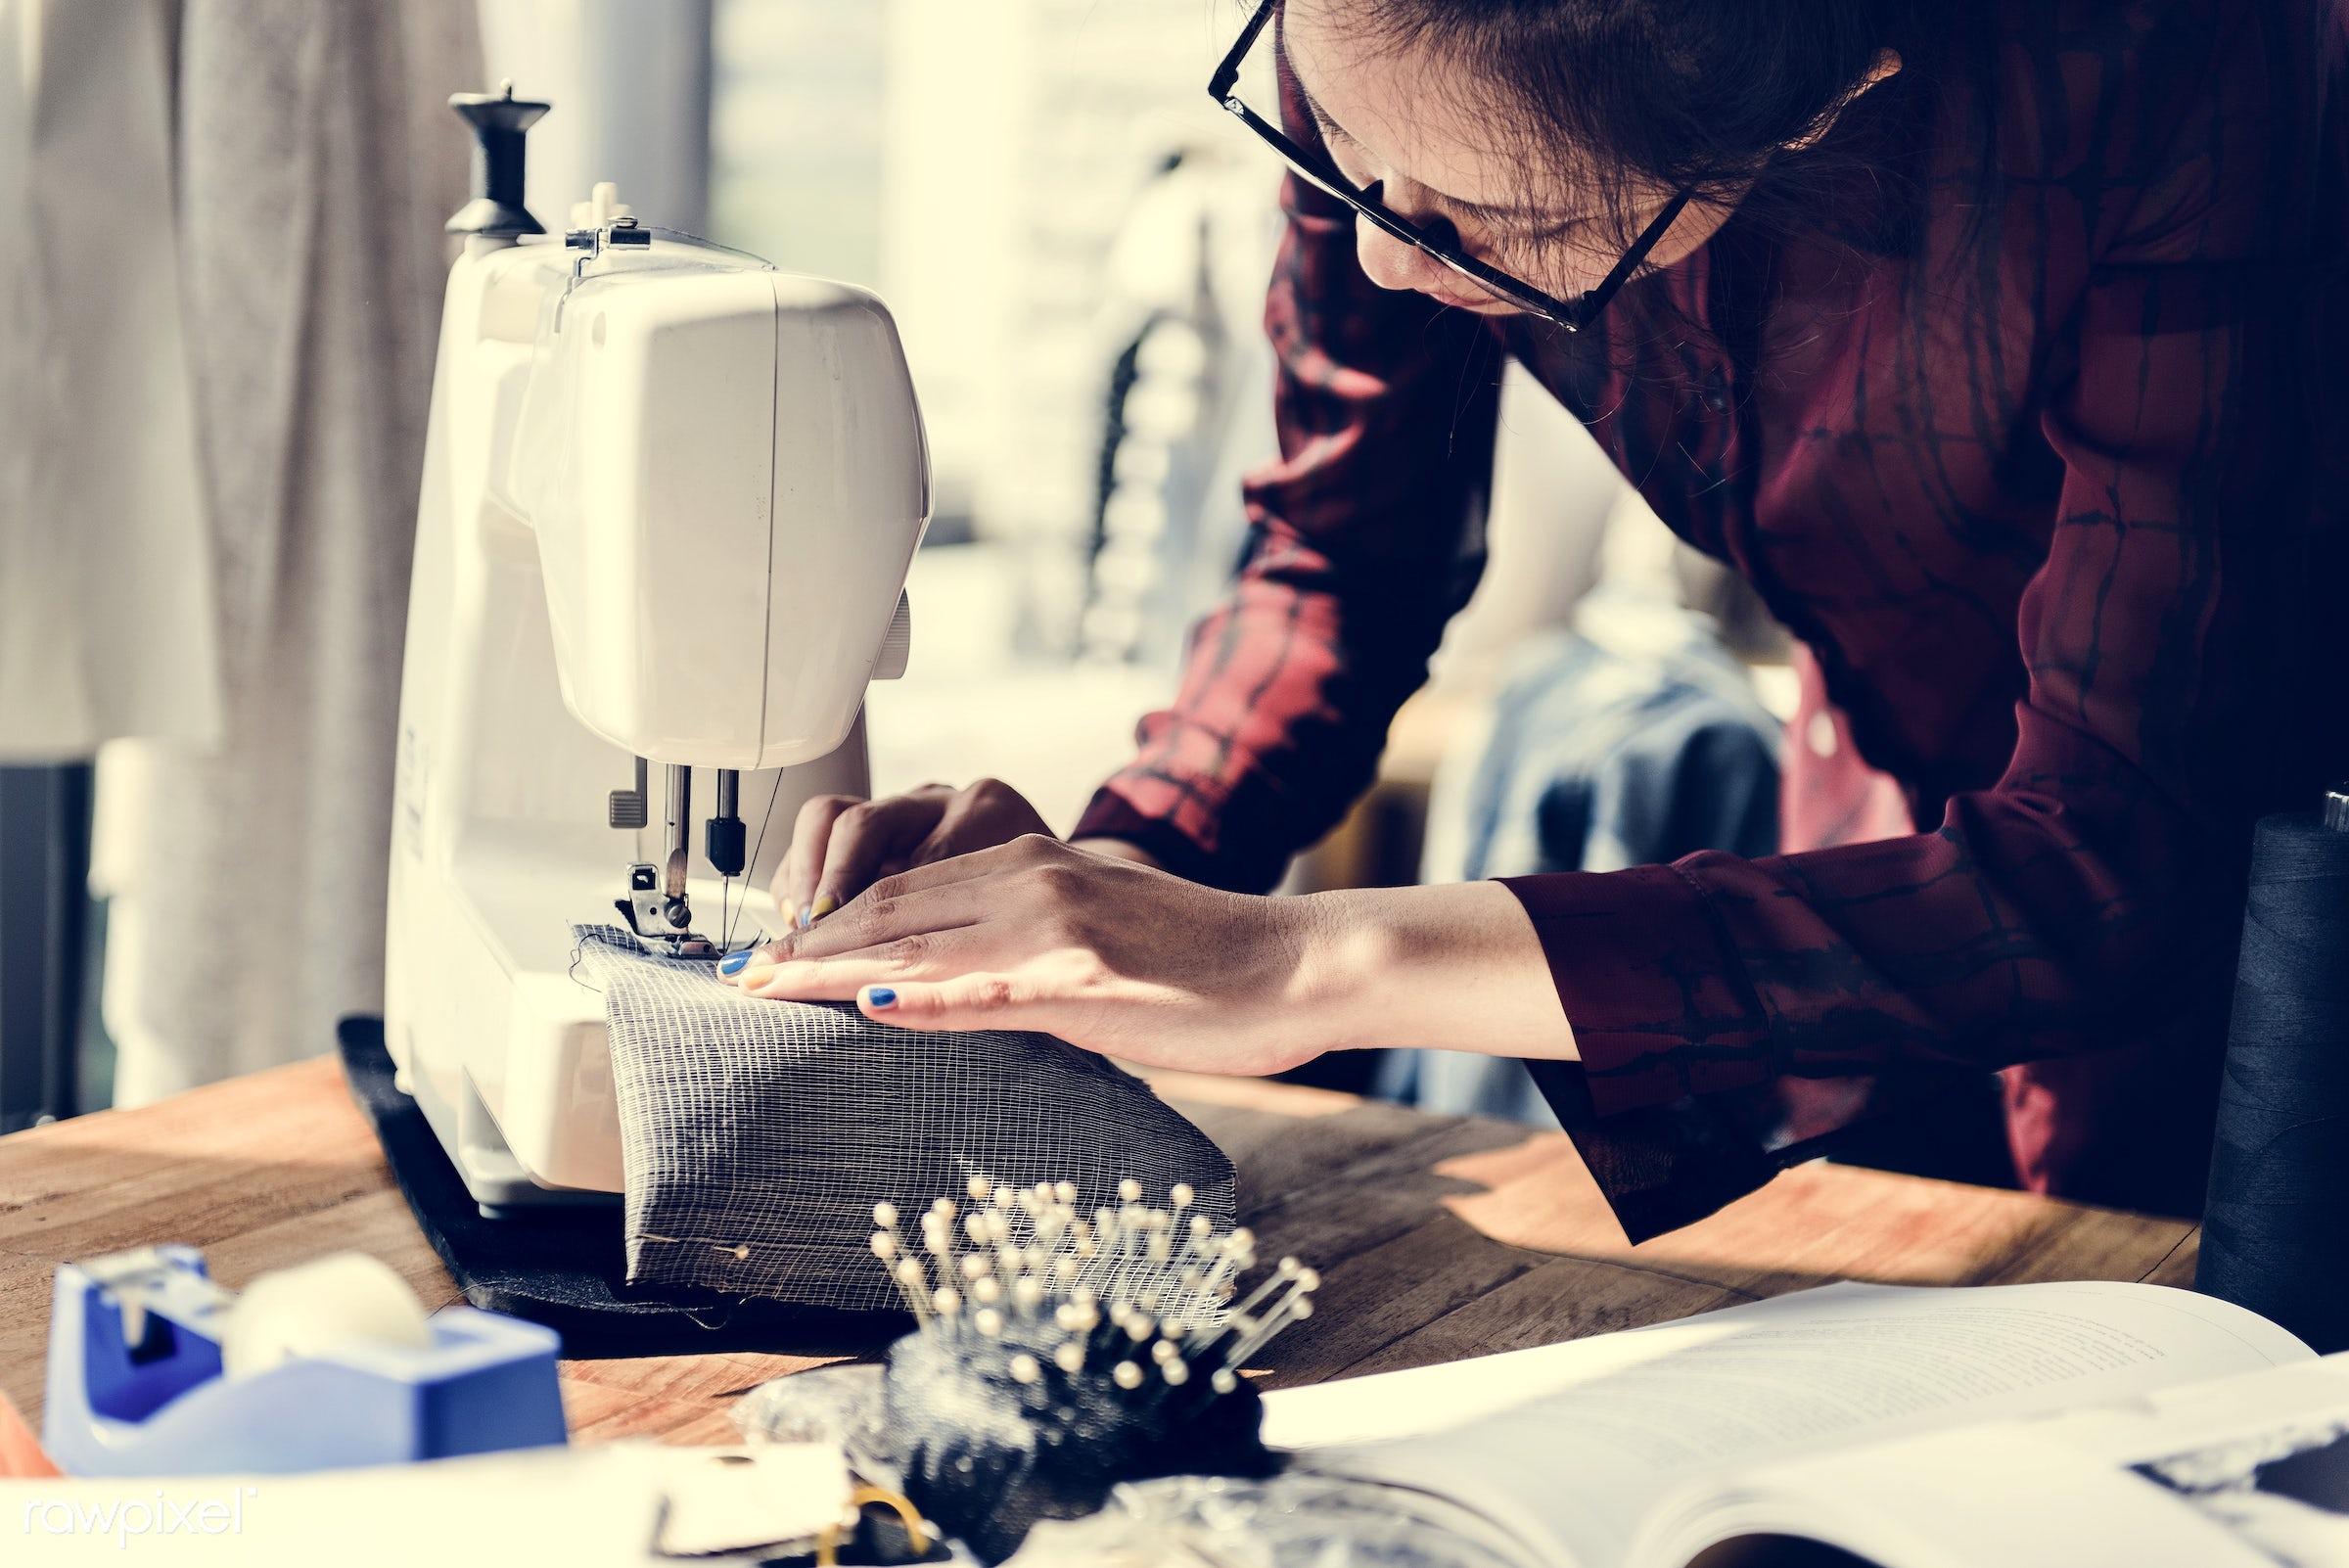 trends, sew, fashion, detail, craft, clothing, garment, fashion studio, profession, tool, equipment, beauty, perfection,...